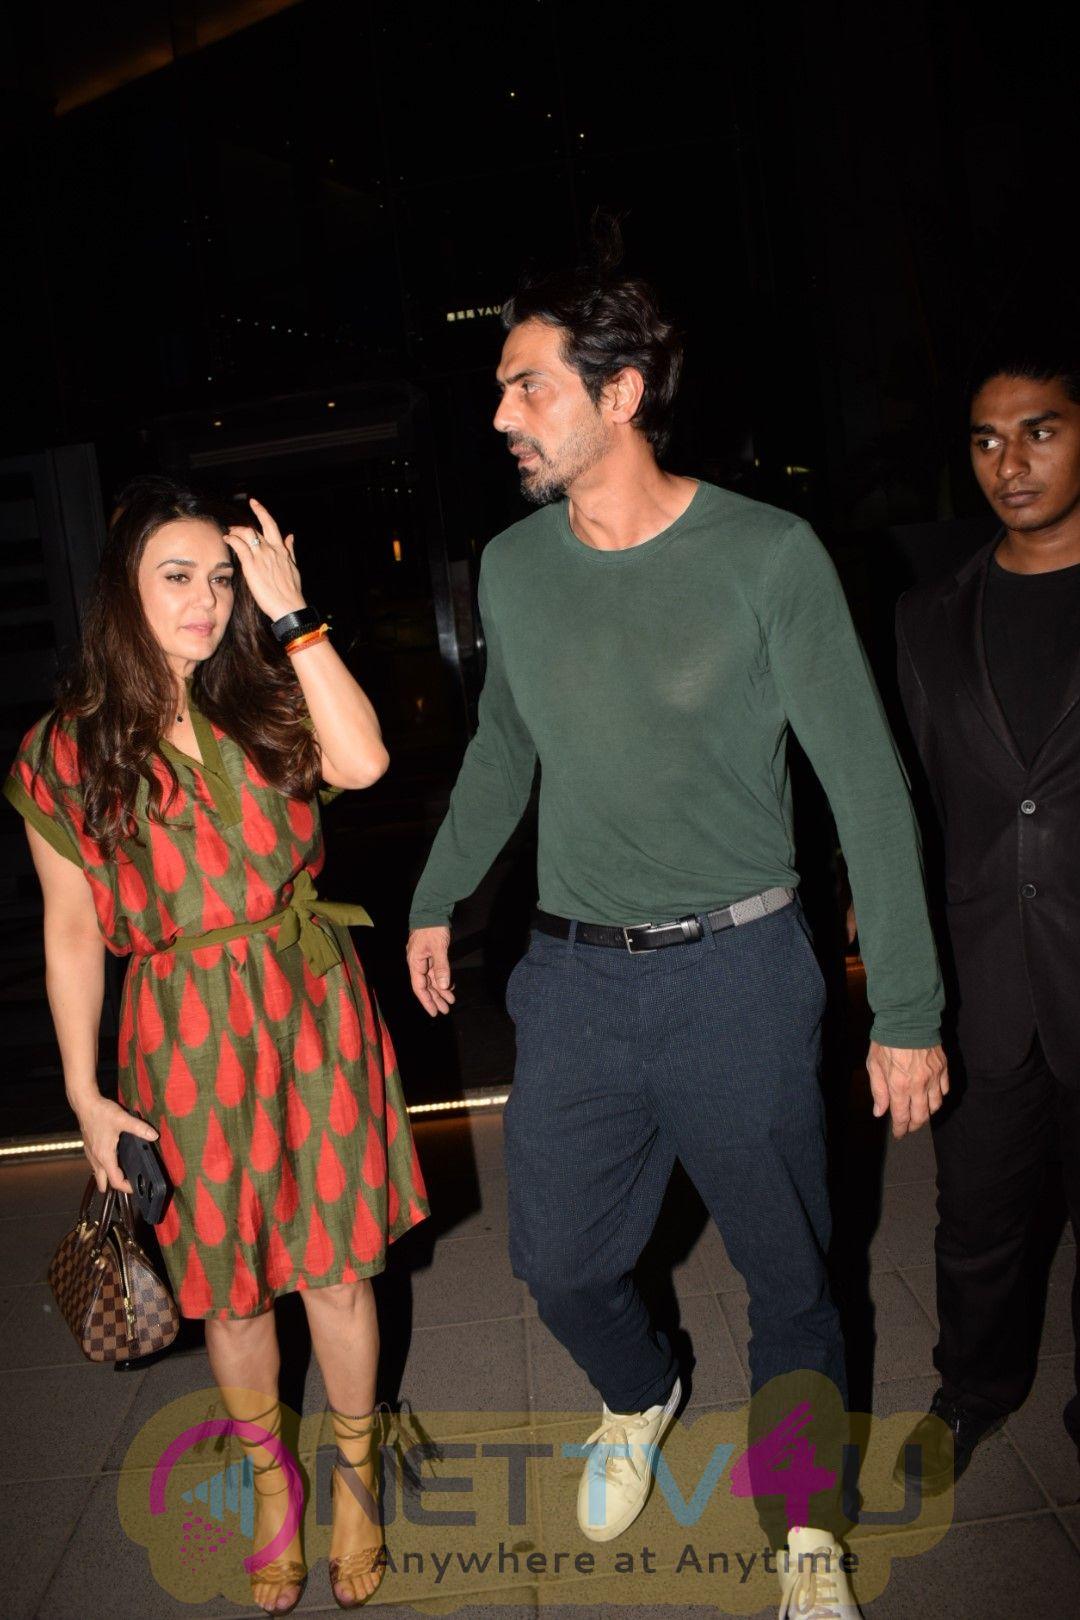 Preity Zinta & Arjun Rampal Came To Yautcha BKC